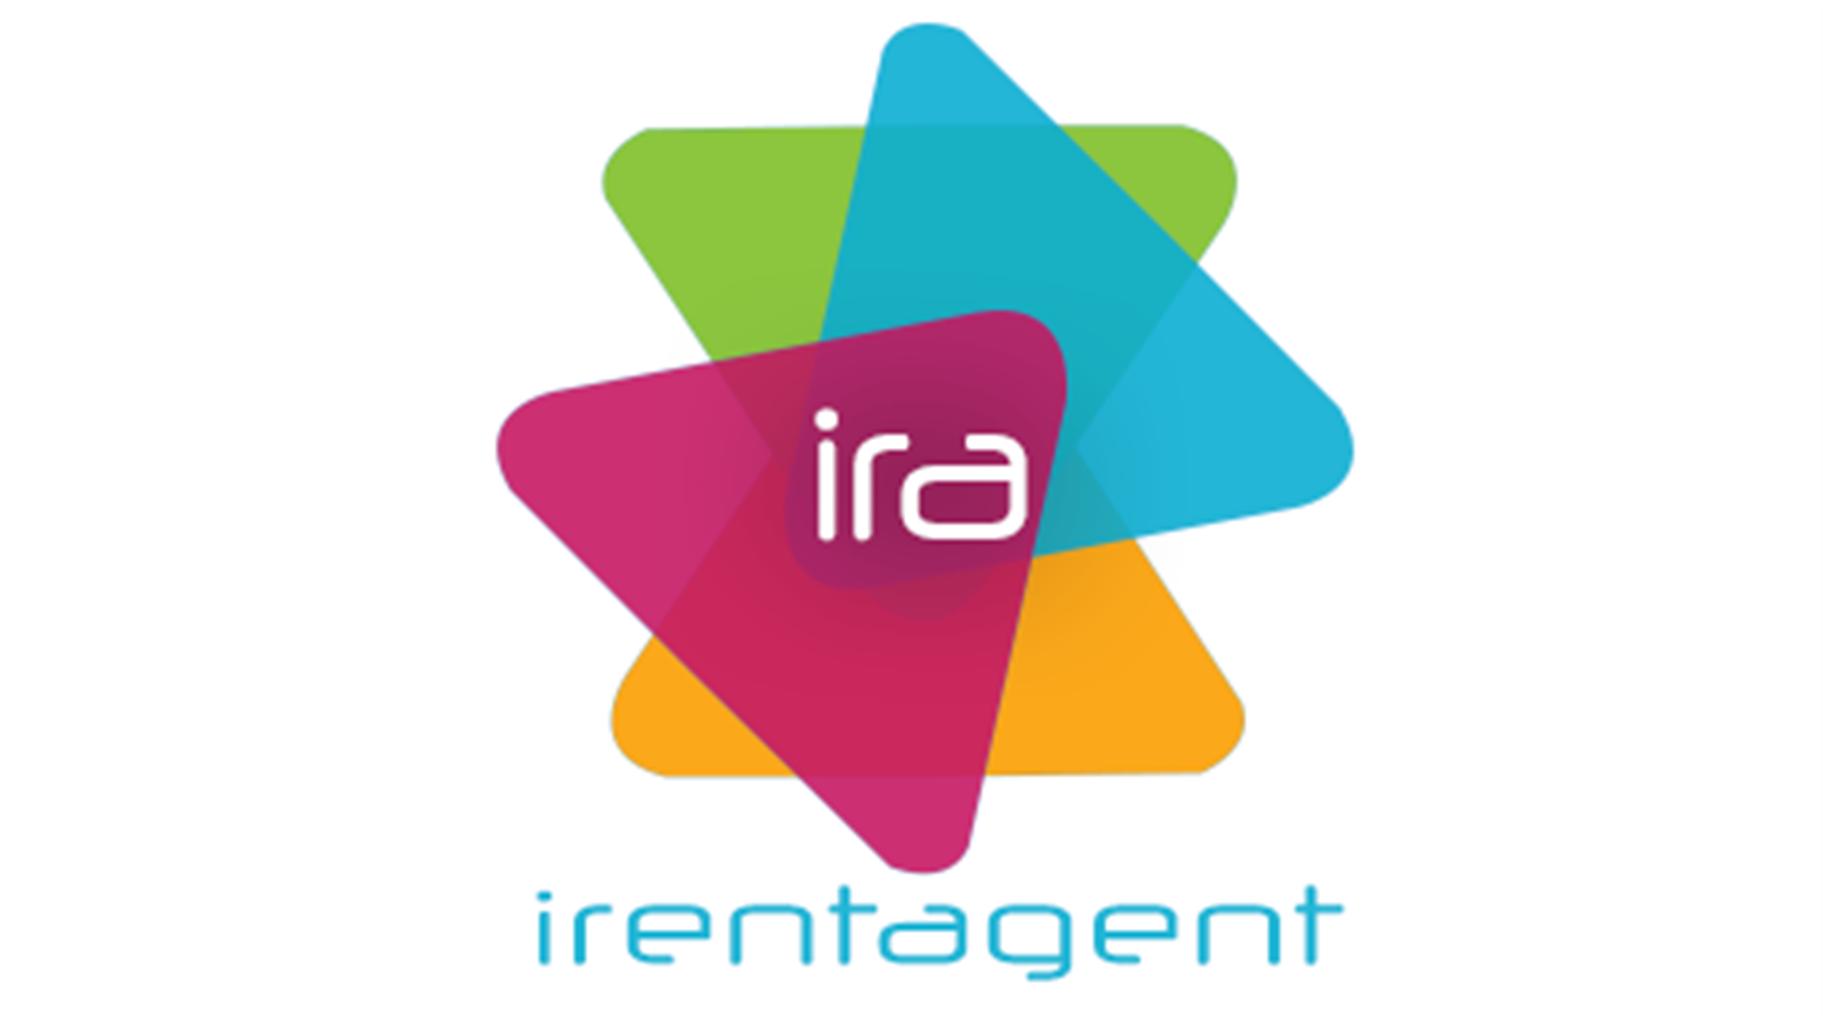 iRentAgent